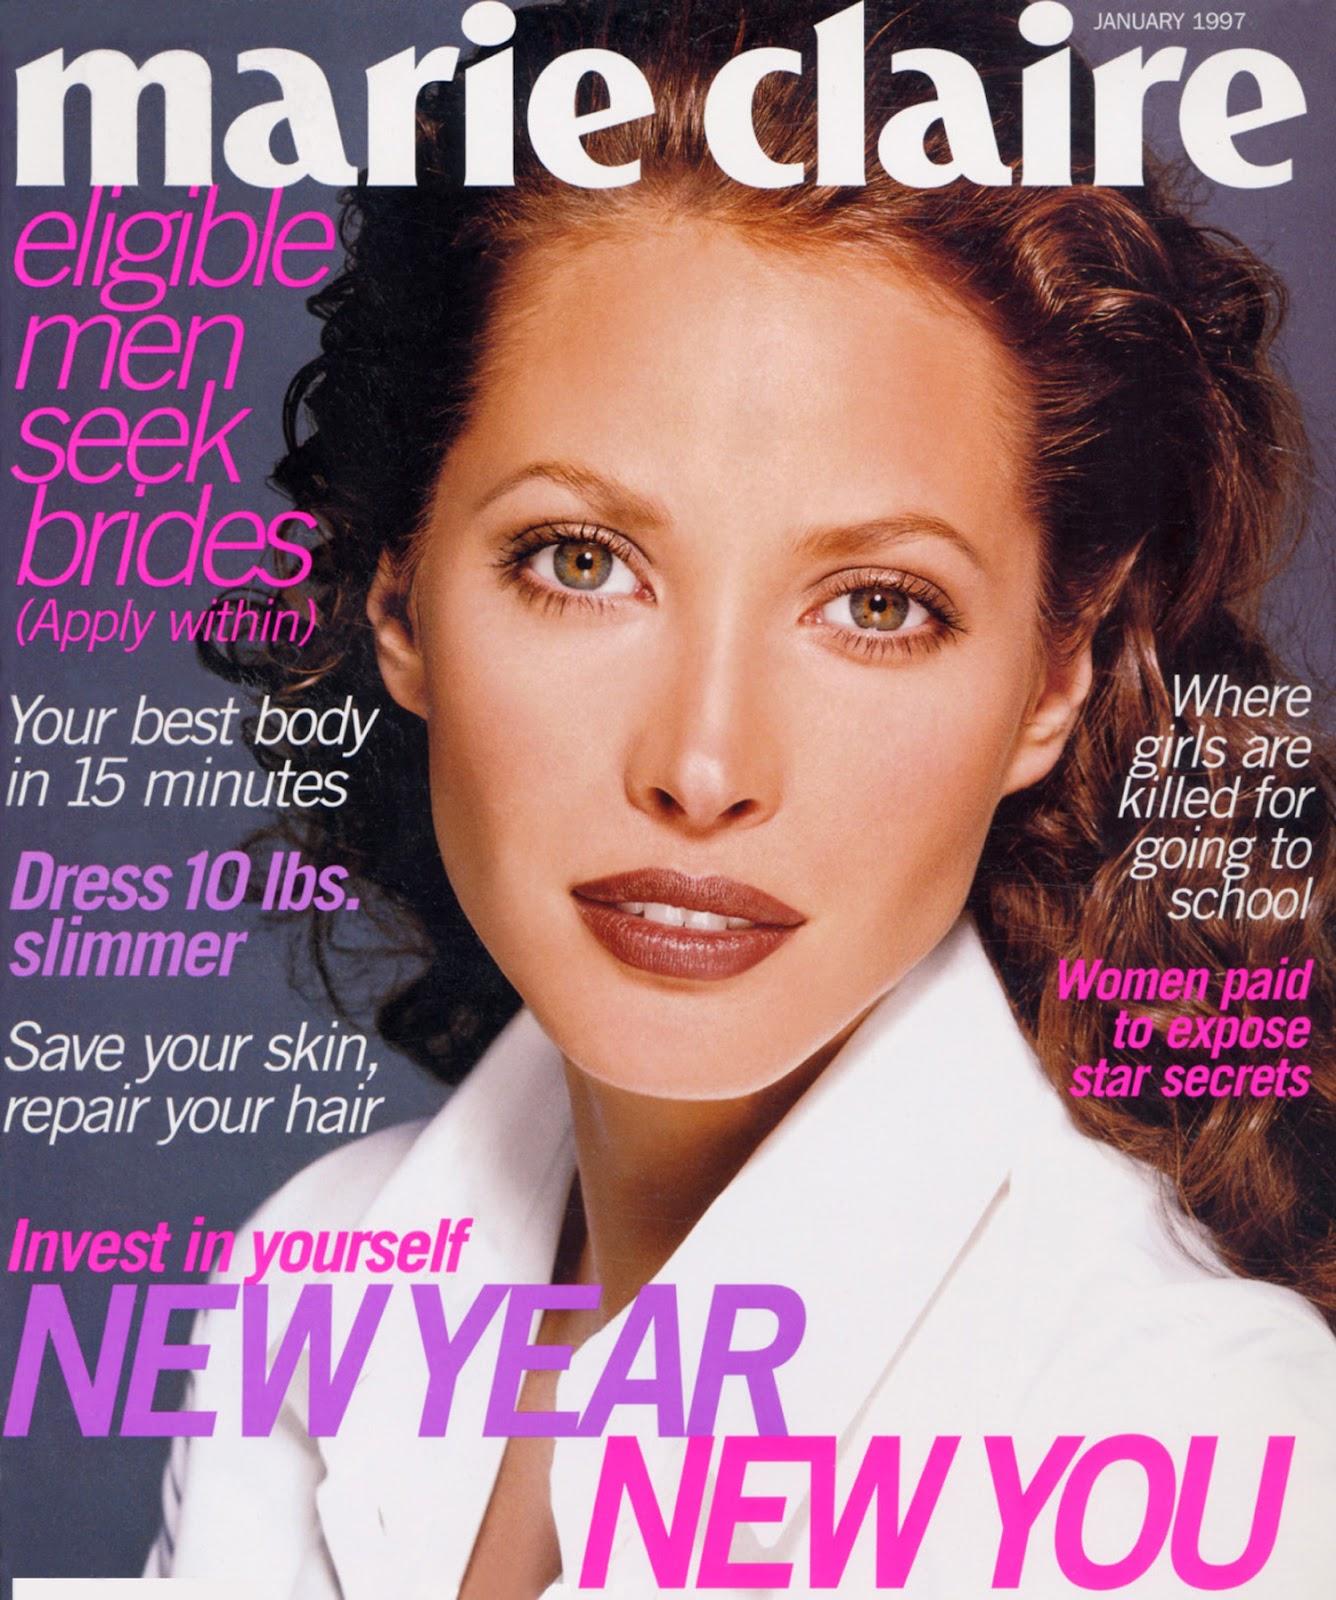 http://2.bp.blogspot.com/-w42HWGahl_s/T3stlZD1HlI/AAAAAAAAG94/RvzHlKxc190/s1600/Christy+Turlington+1997+01+Marie+Claire+Usa.jpg